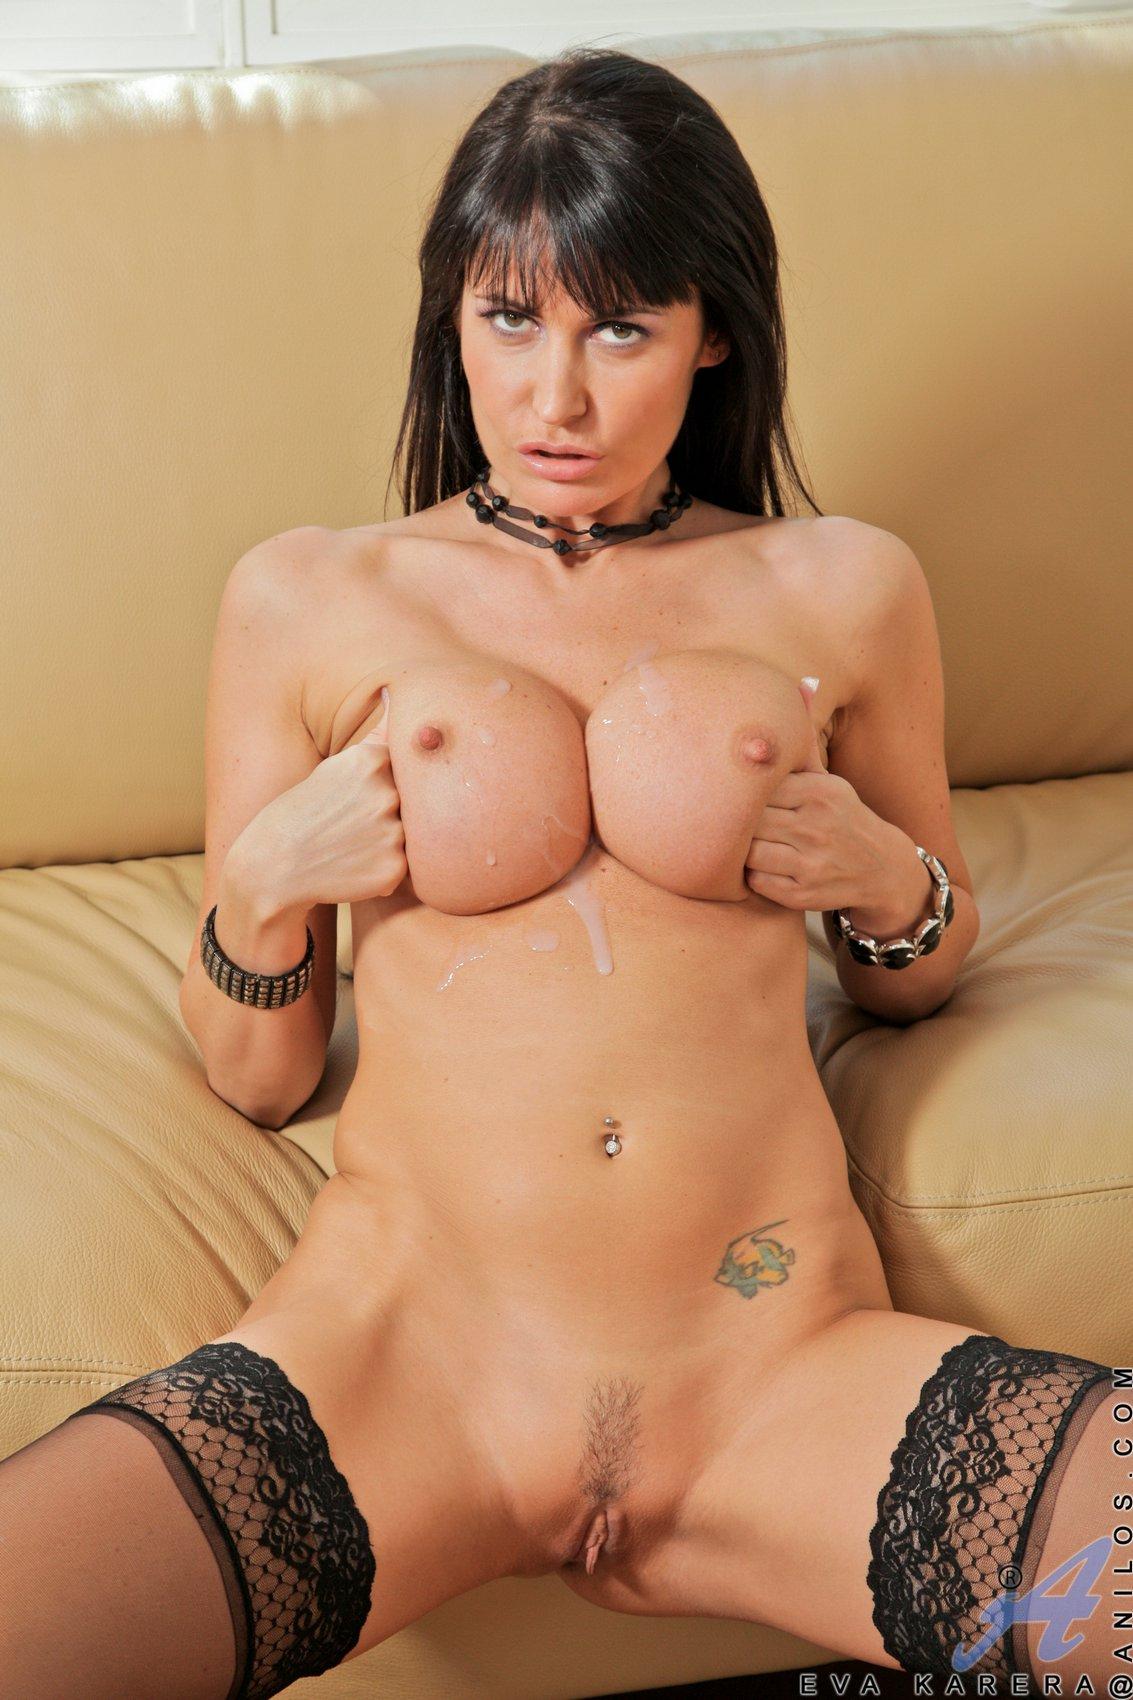 Eva karera anal porn